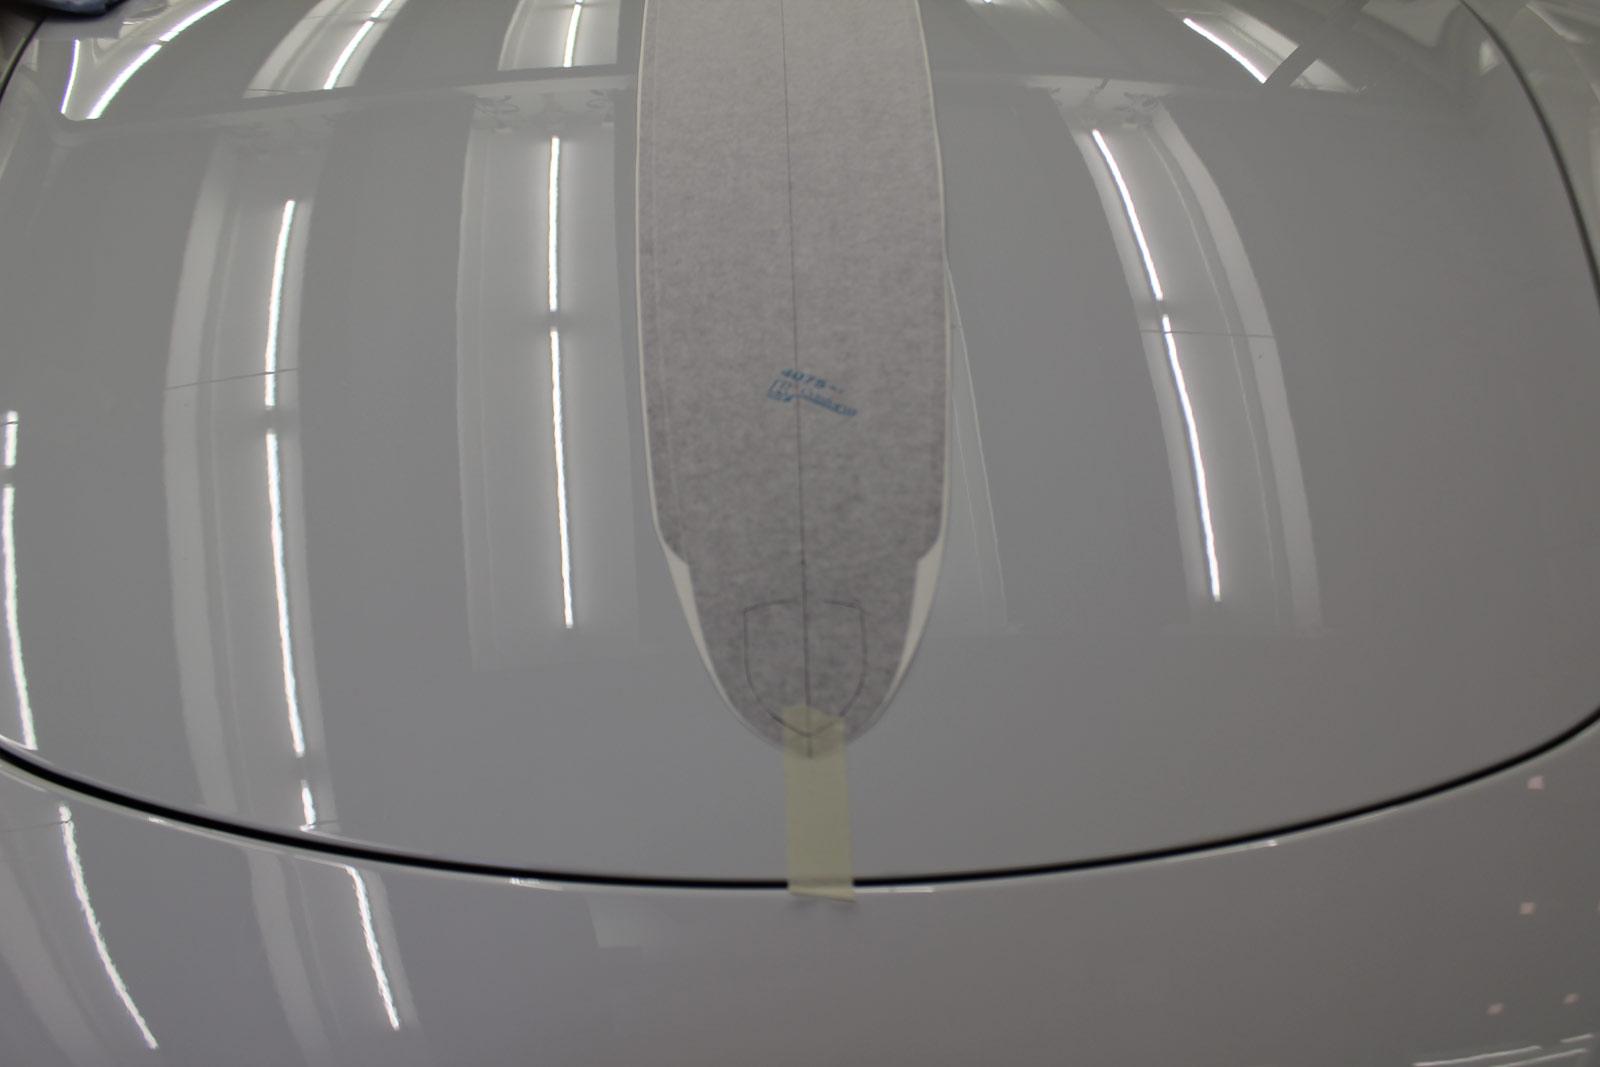 Porsche_Cayman_2014_weiss_Rallyestreifen_gunmetal_metallic_matt_mit_schwarz_matt_01